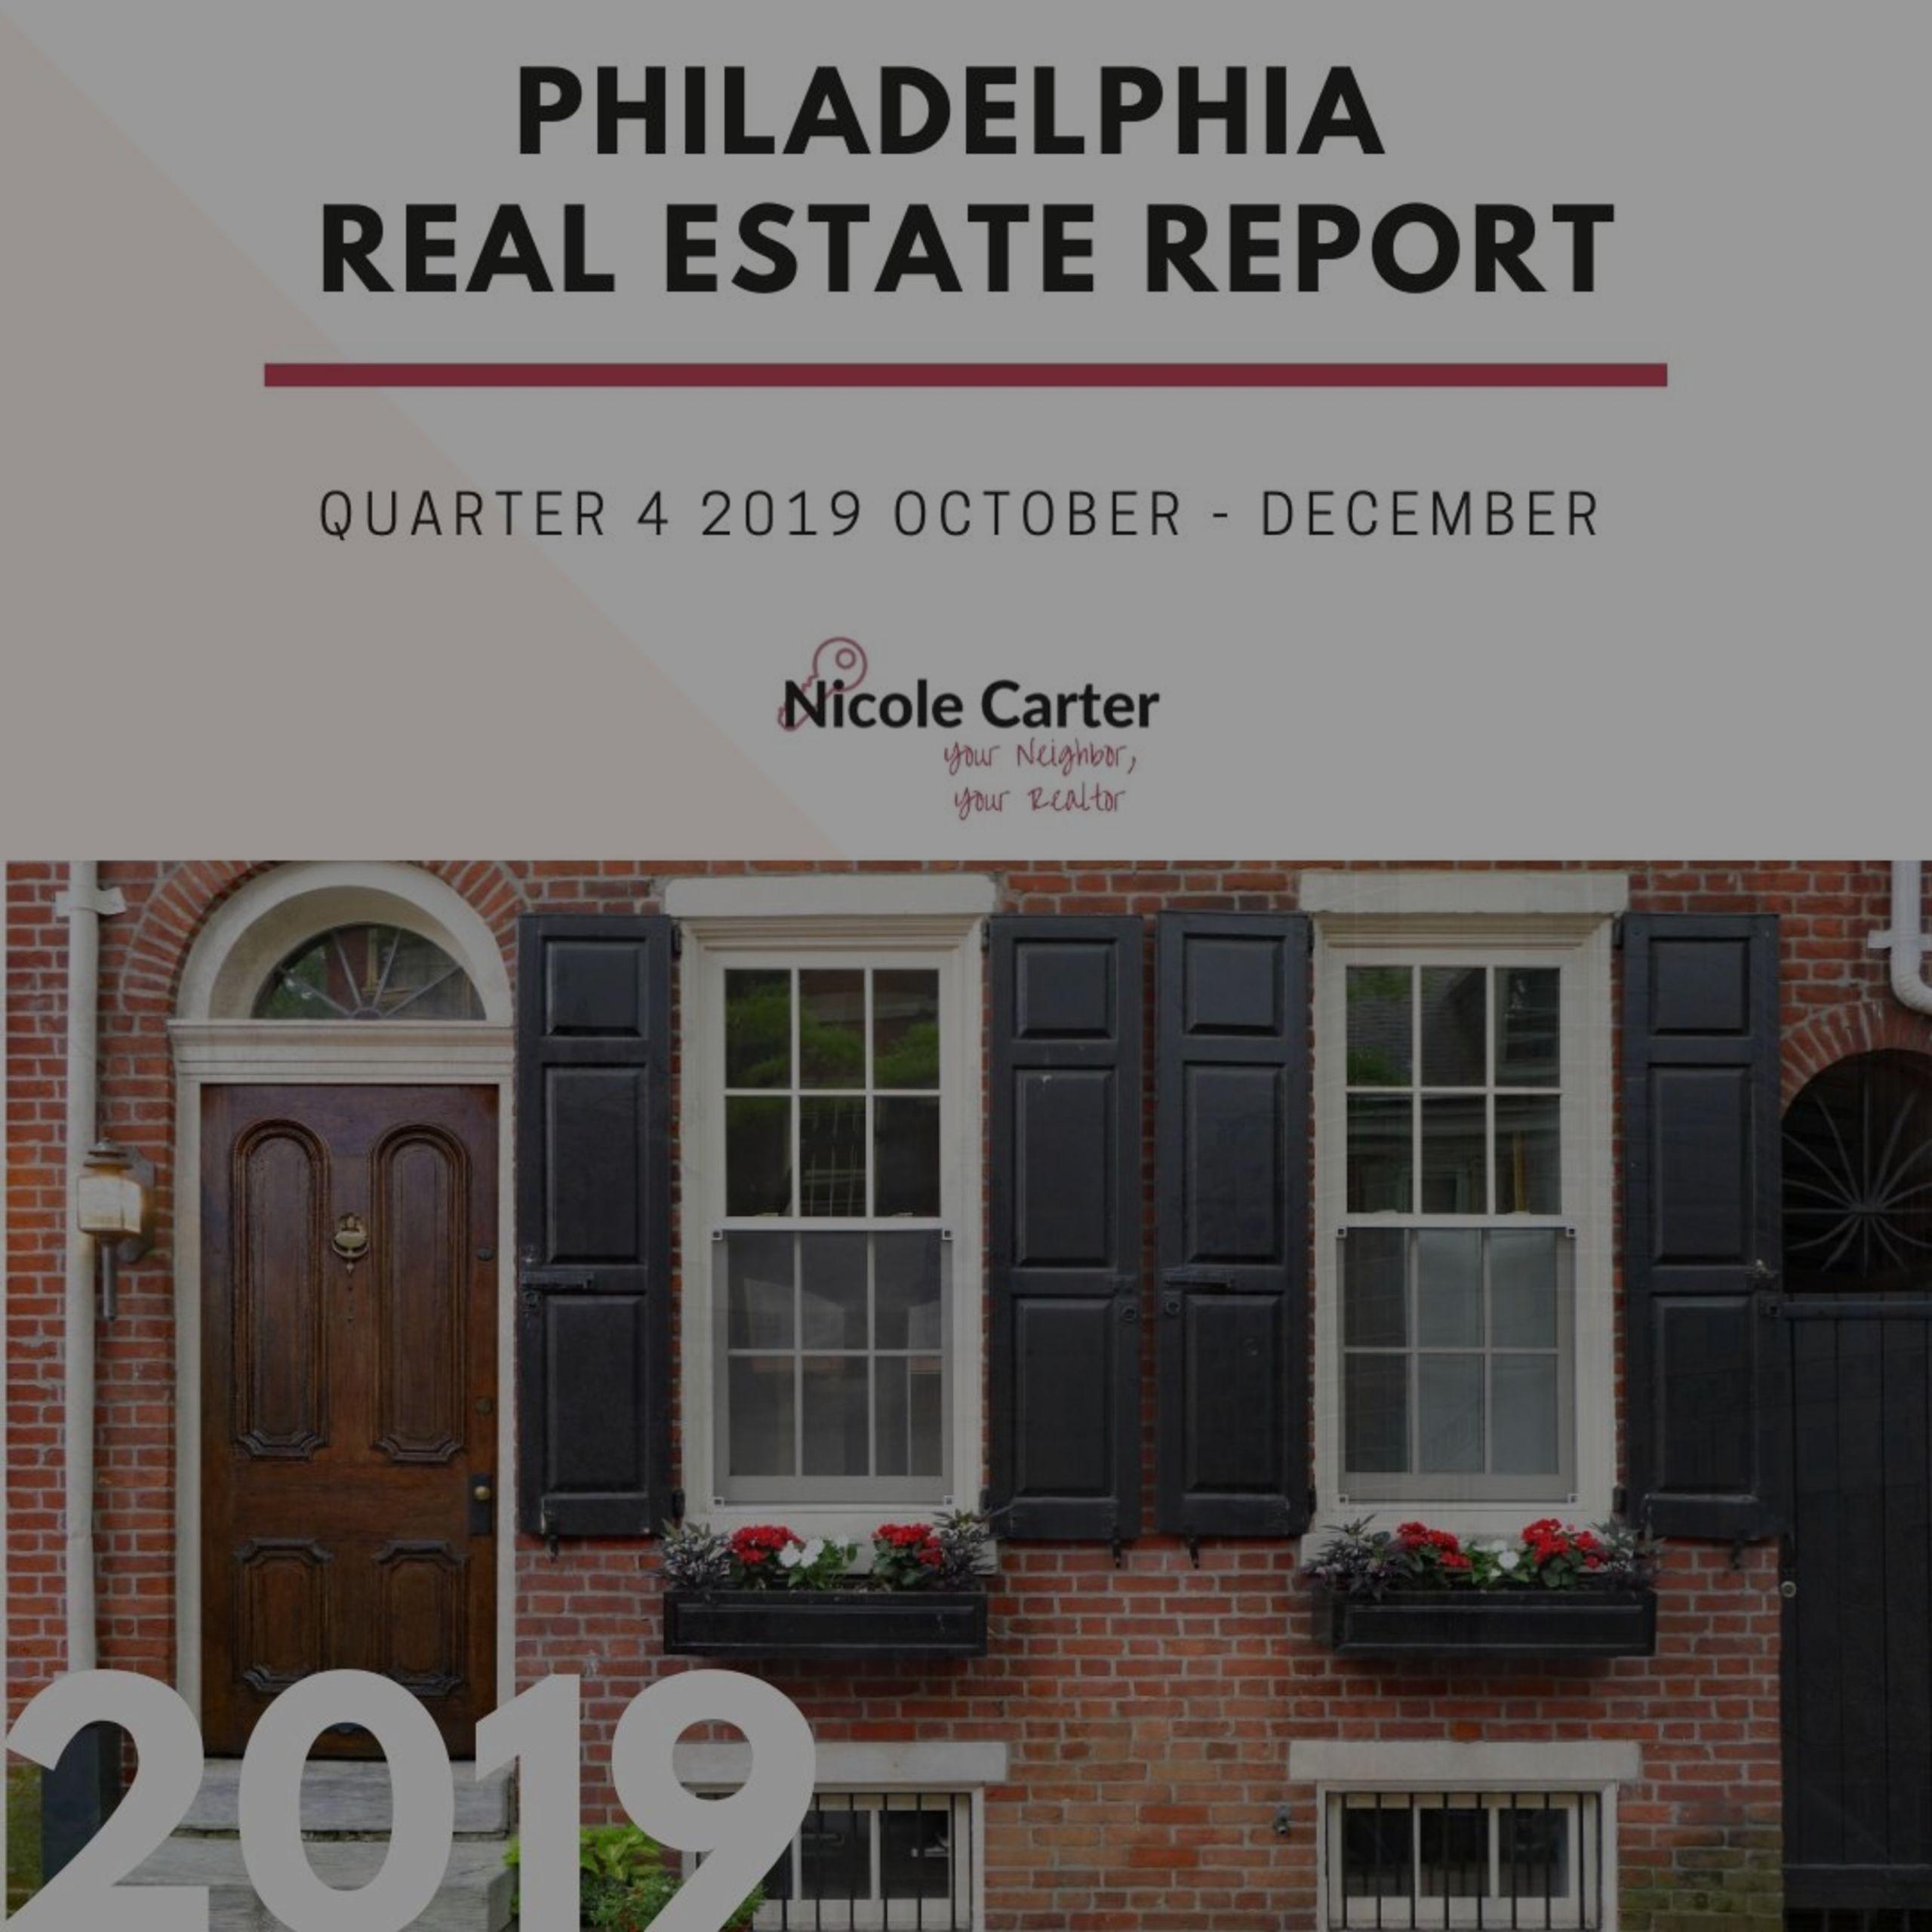 Philadelphia Real Estate Report Quarter 4 October – December